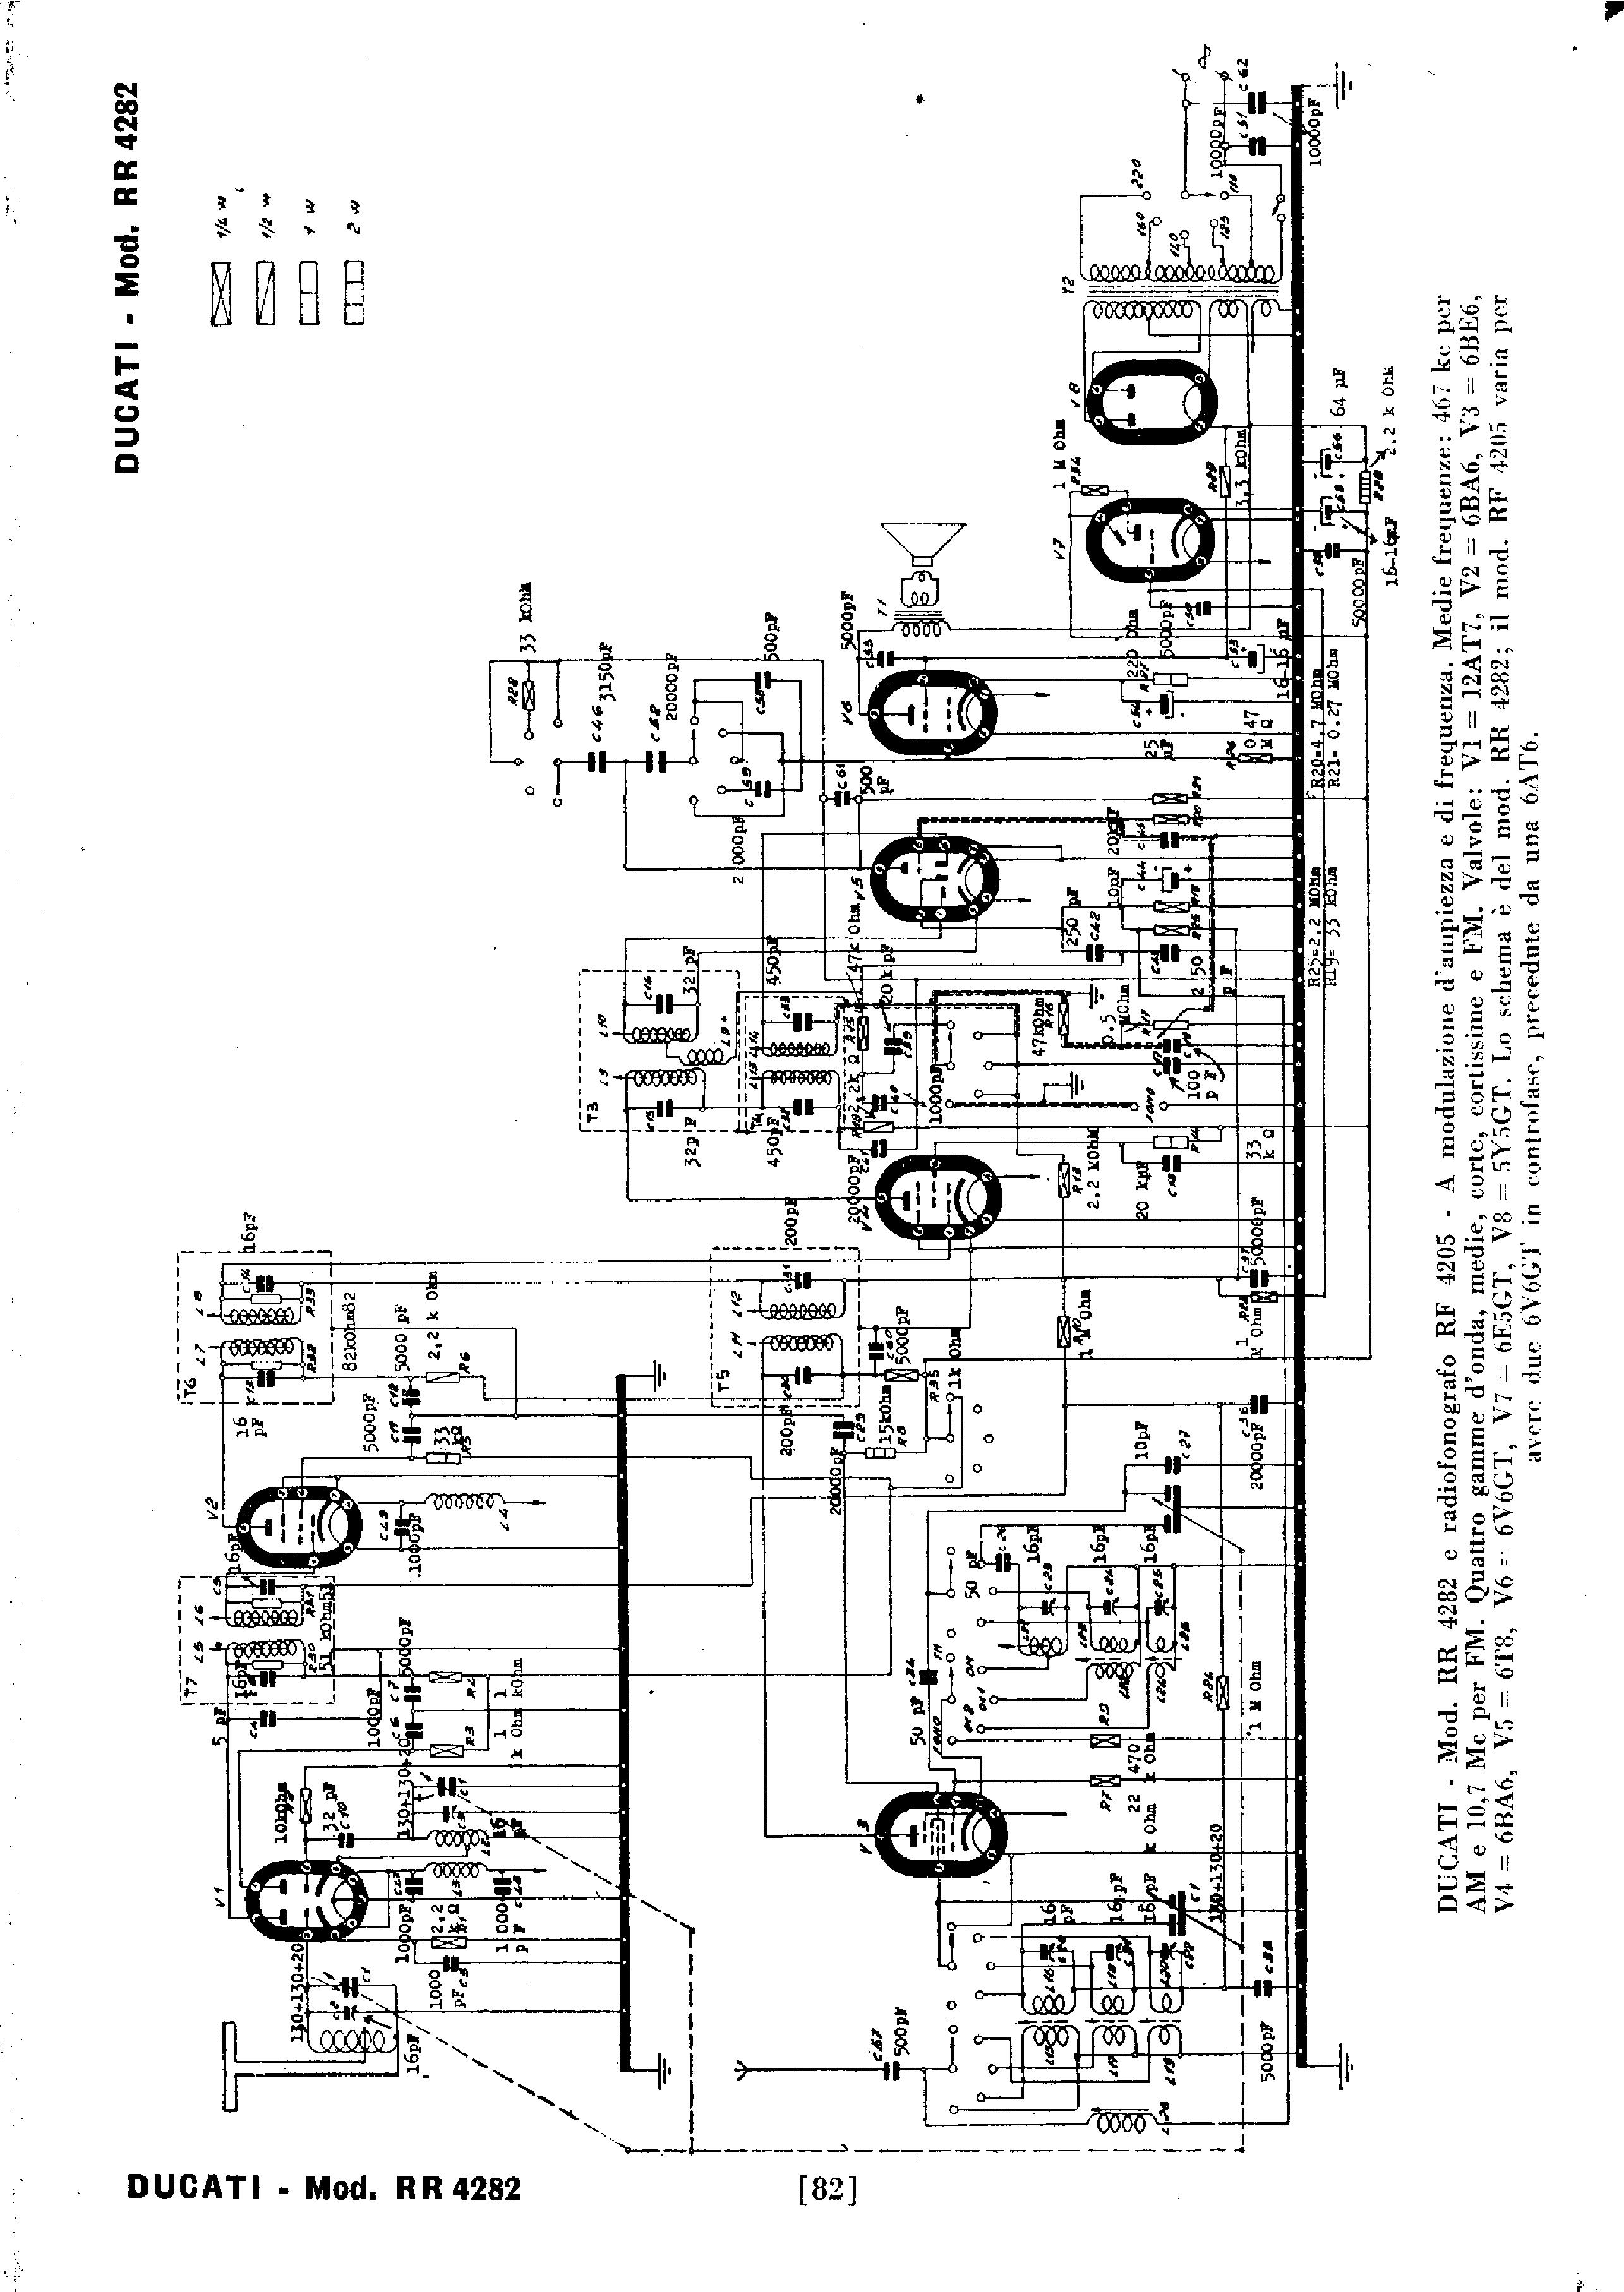 ducati rr4282 sch service manual download  schematics